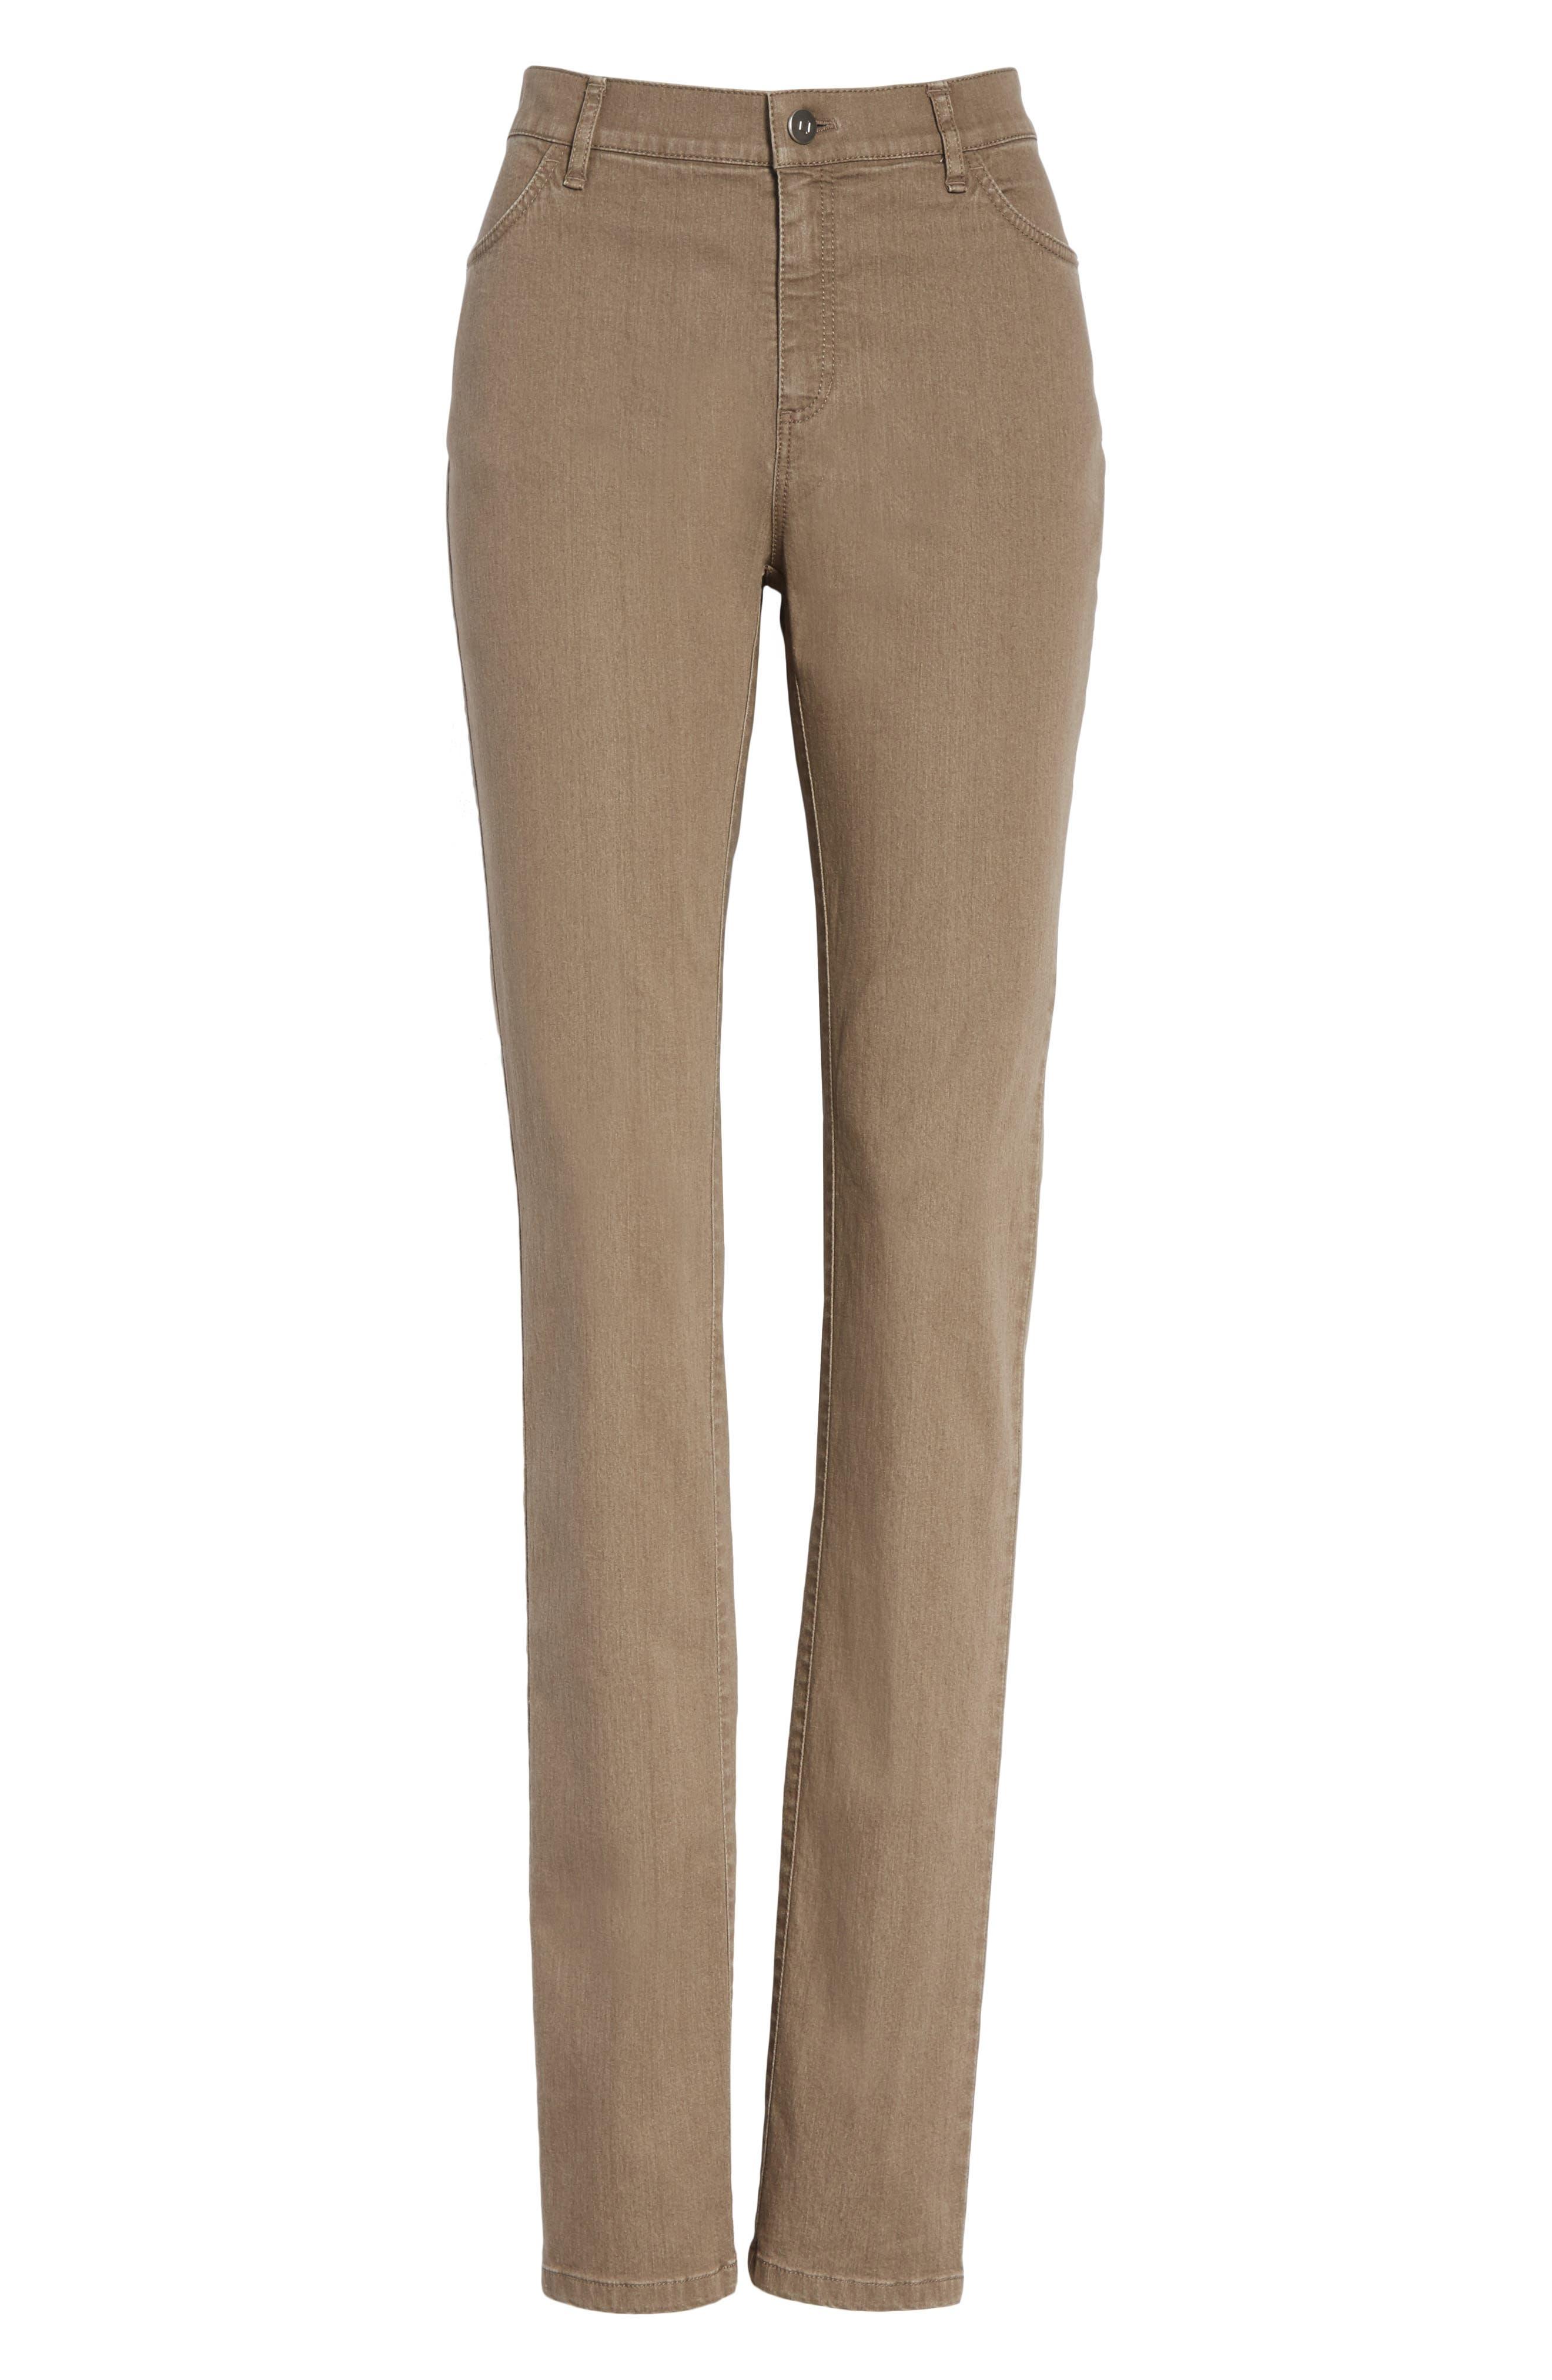 'Primo Denim' Curvy Fit Slim Leg Jeans,                             Alternate thumbnail 7, color,                             TUMBLEWEED